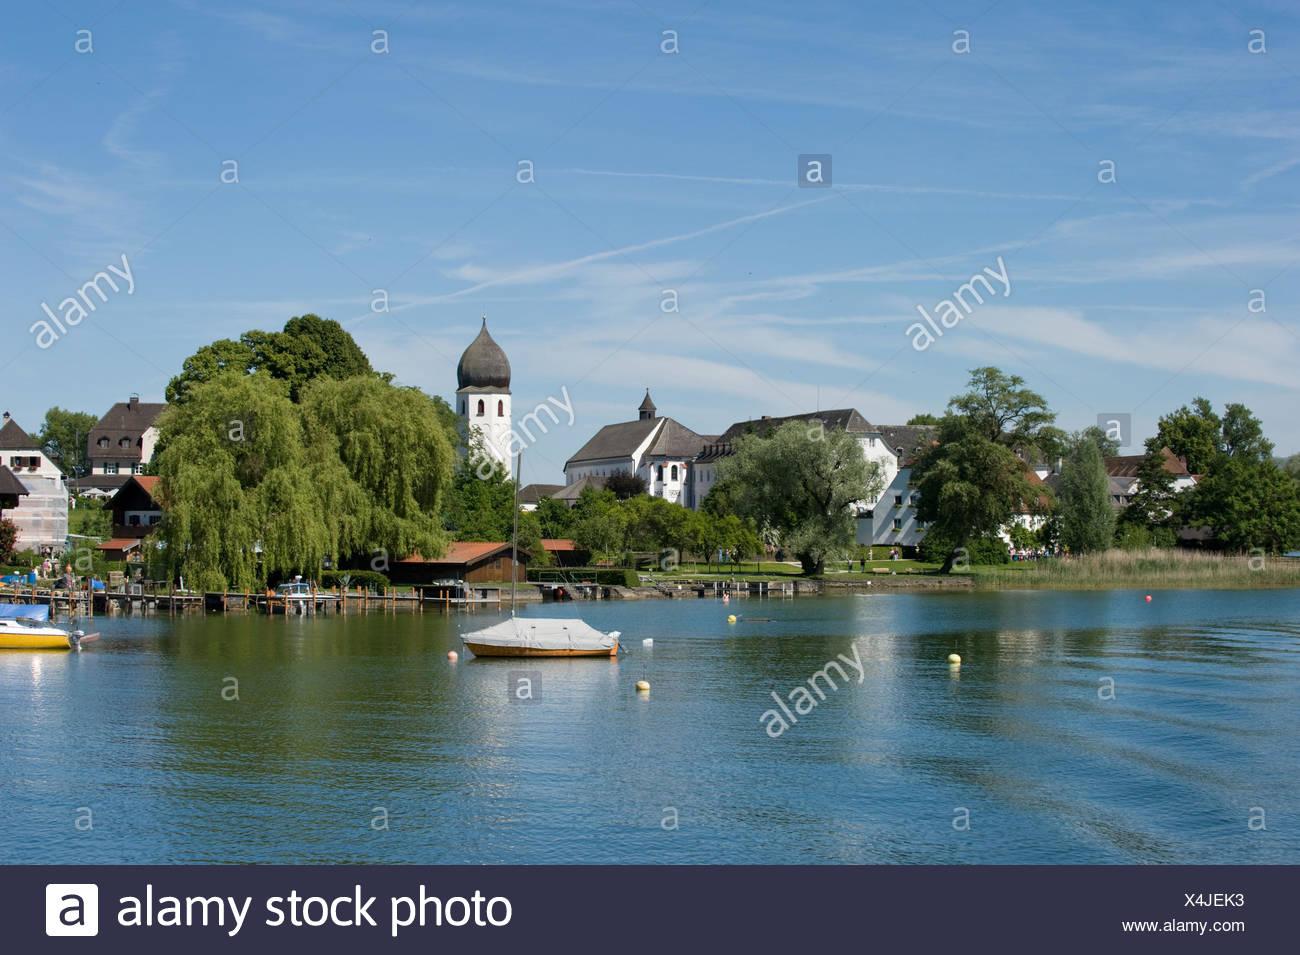 bavaria horizontal landscape format chiemsee island girl chiemgau kloster frauenchiemsee frauenworth Stock Photo